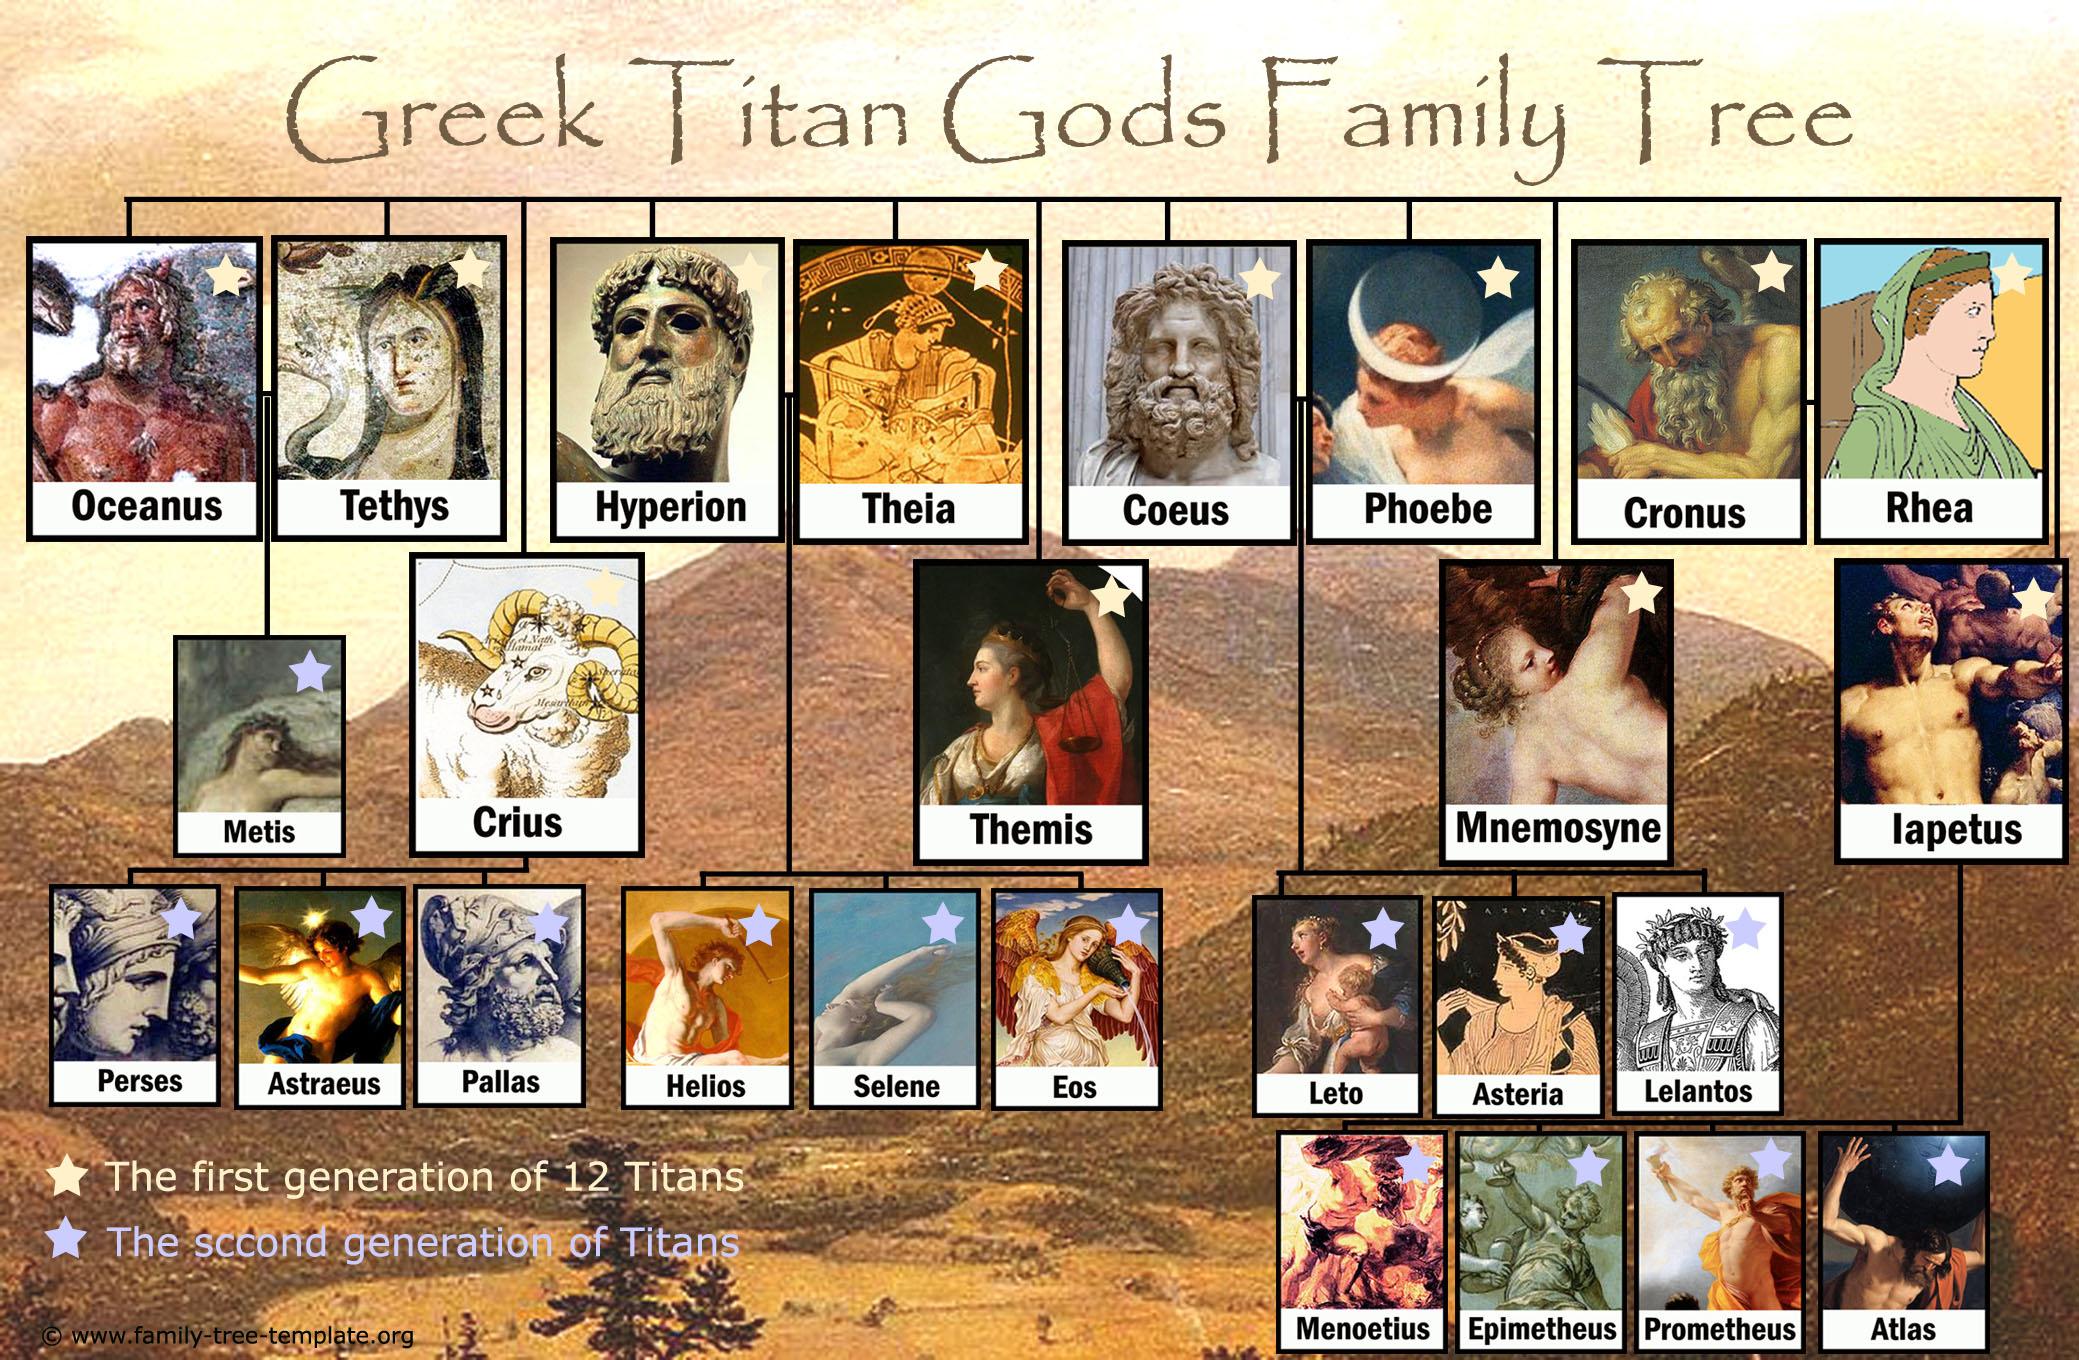 Printable family tree of the Greek gods Titans